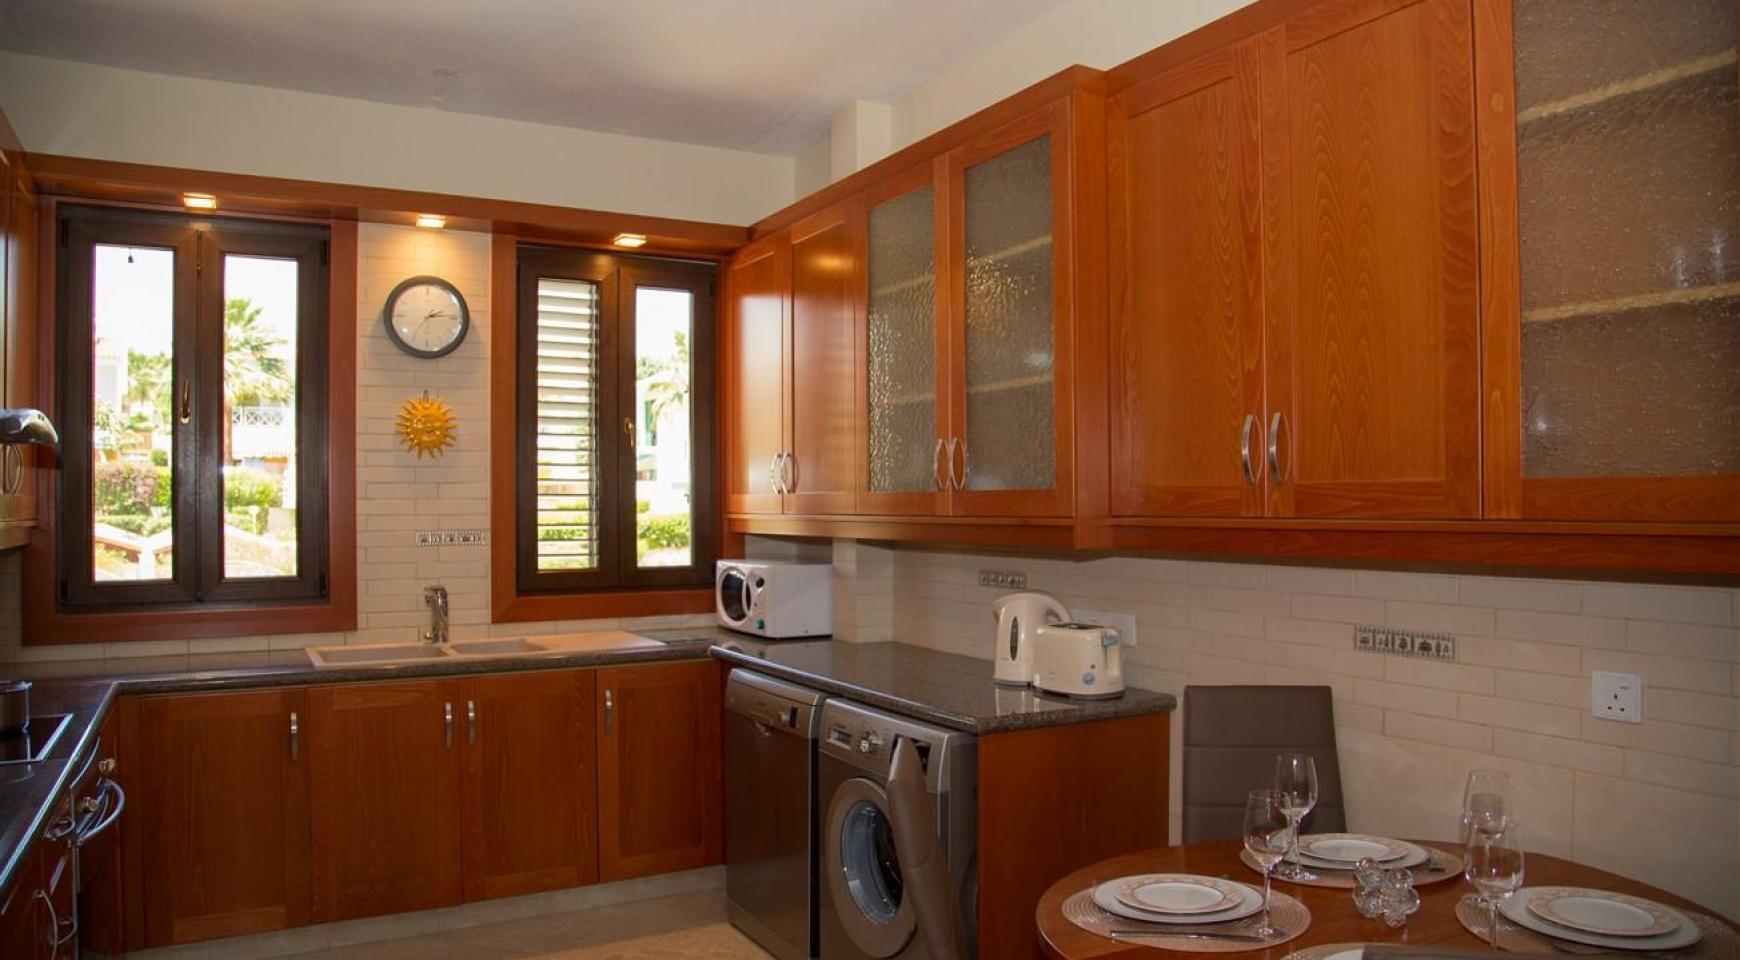 3-Спальная Квартира на Берегу Моря в Комплексе Thera   - 25